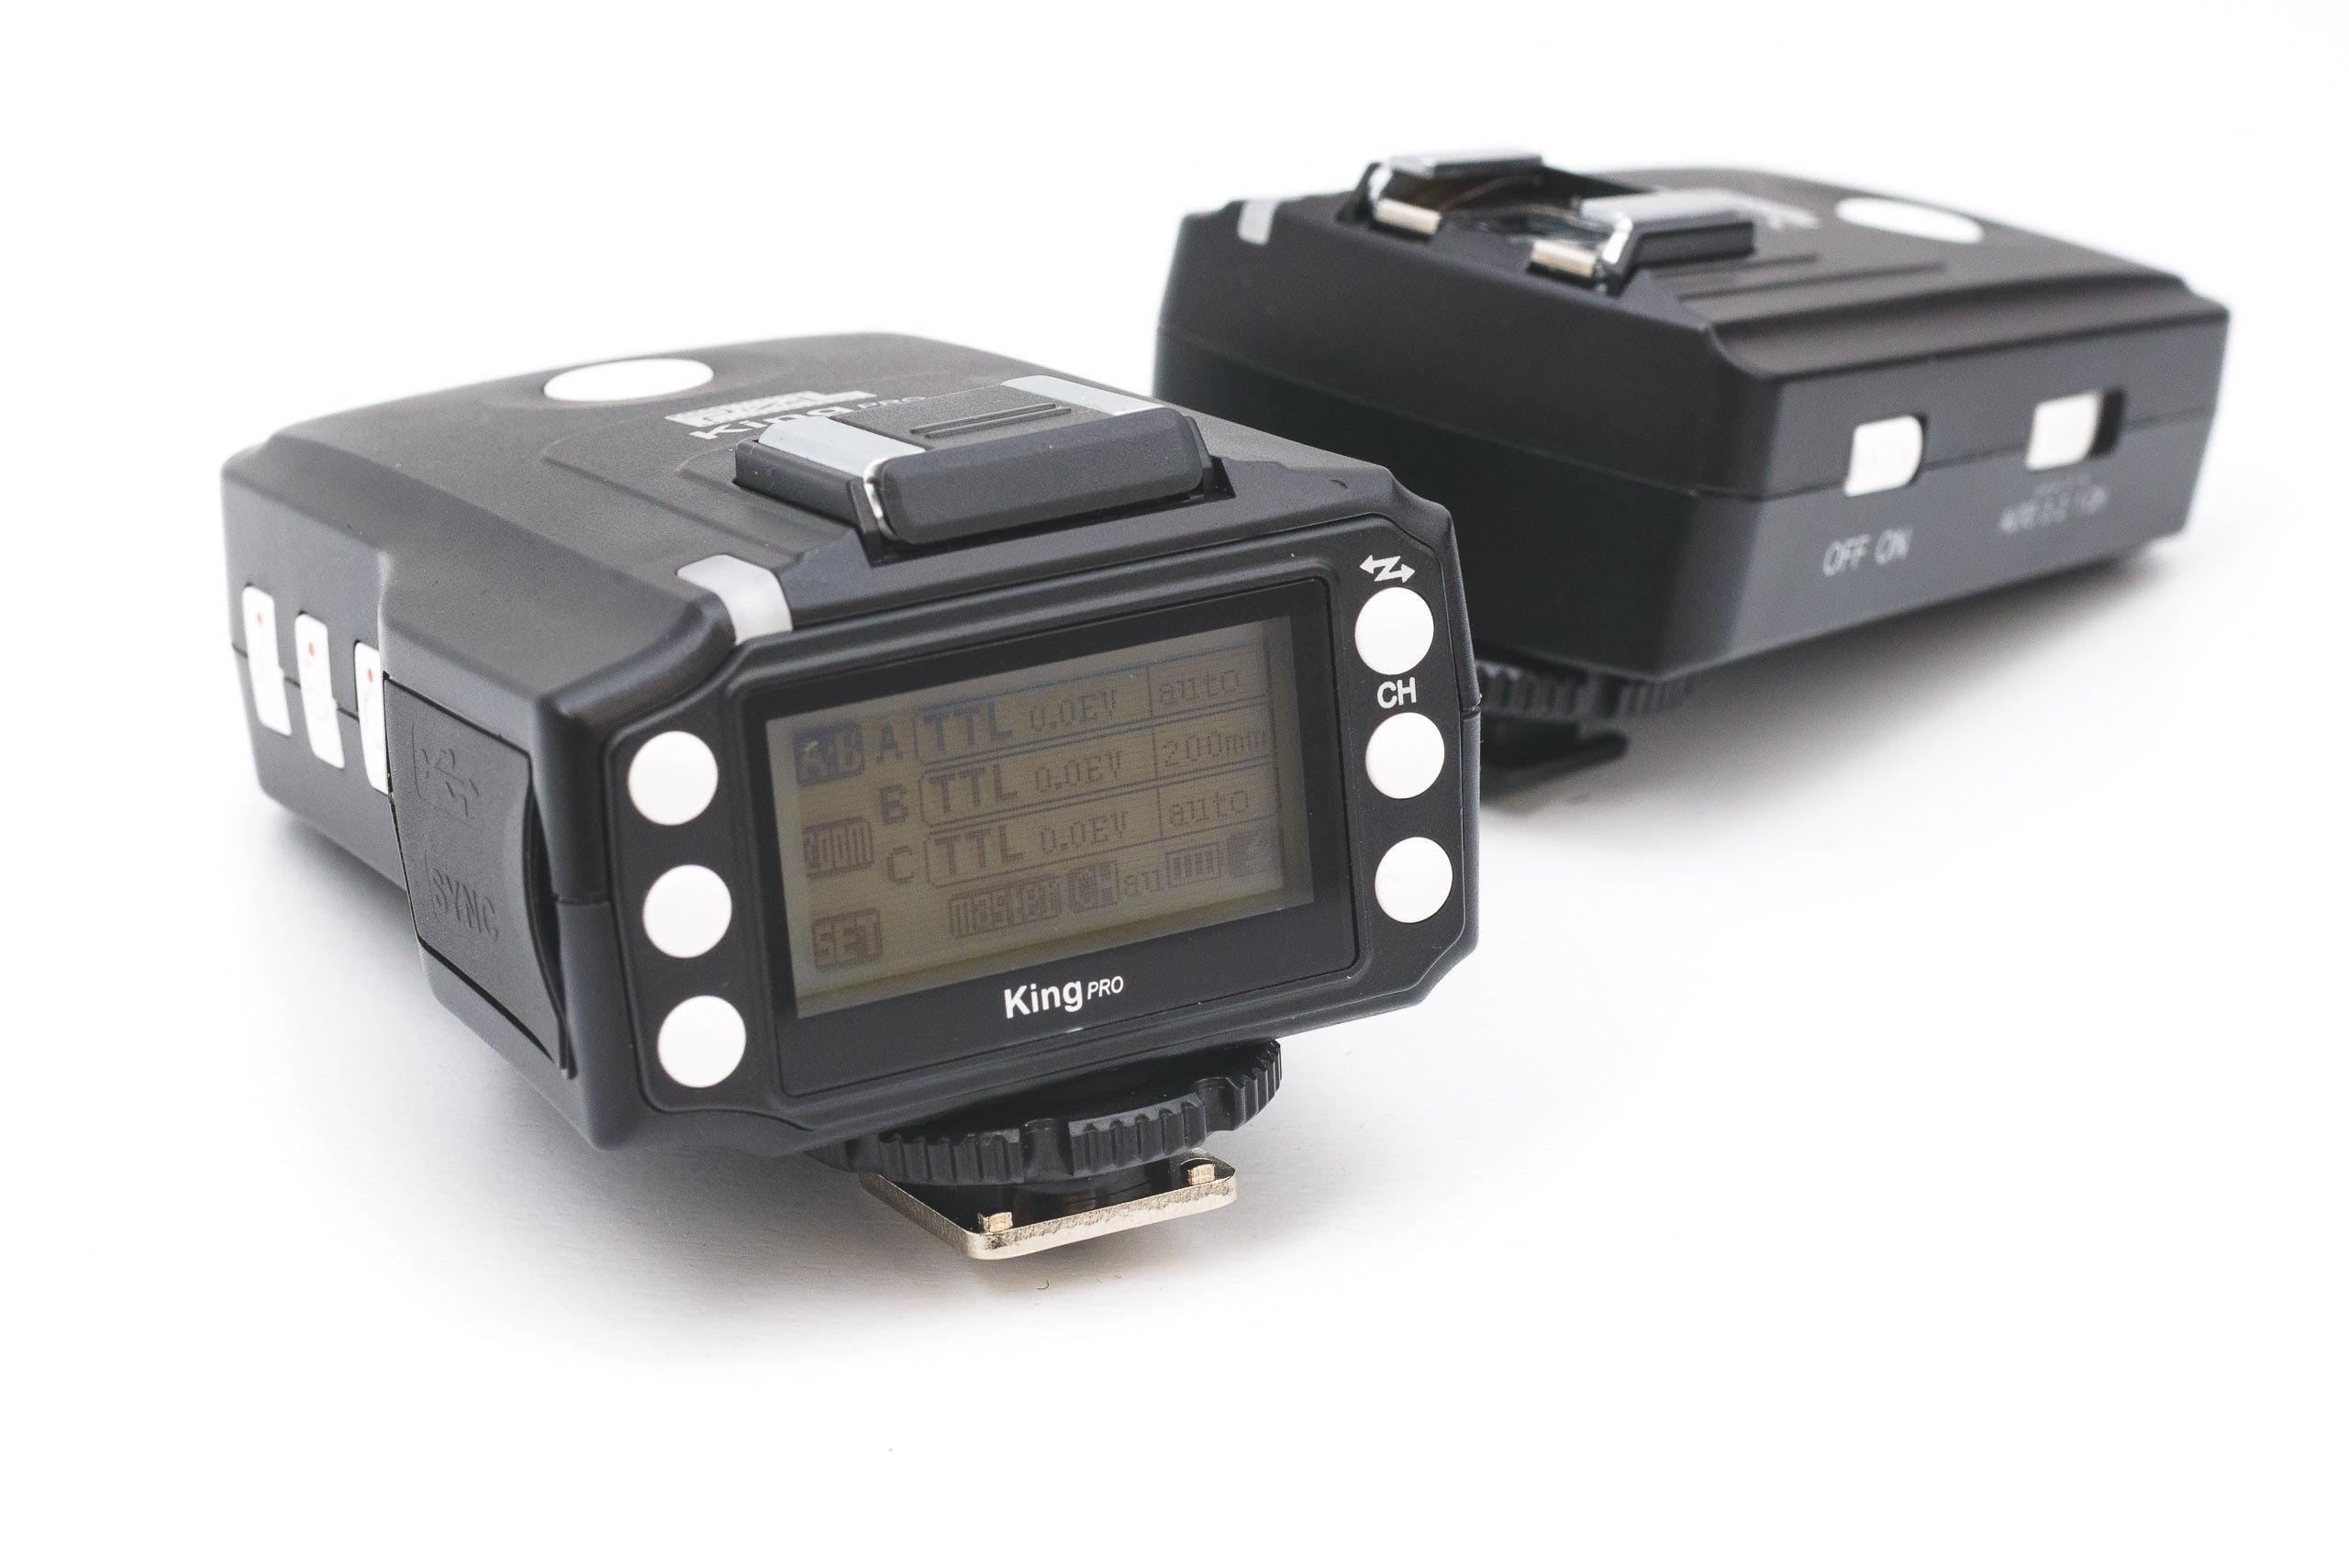 Trigger Pixel King pro for Nikon- tốc độ cao 1/8000s Photoviet